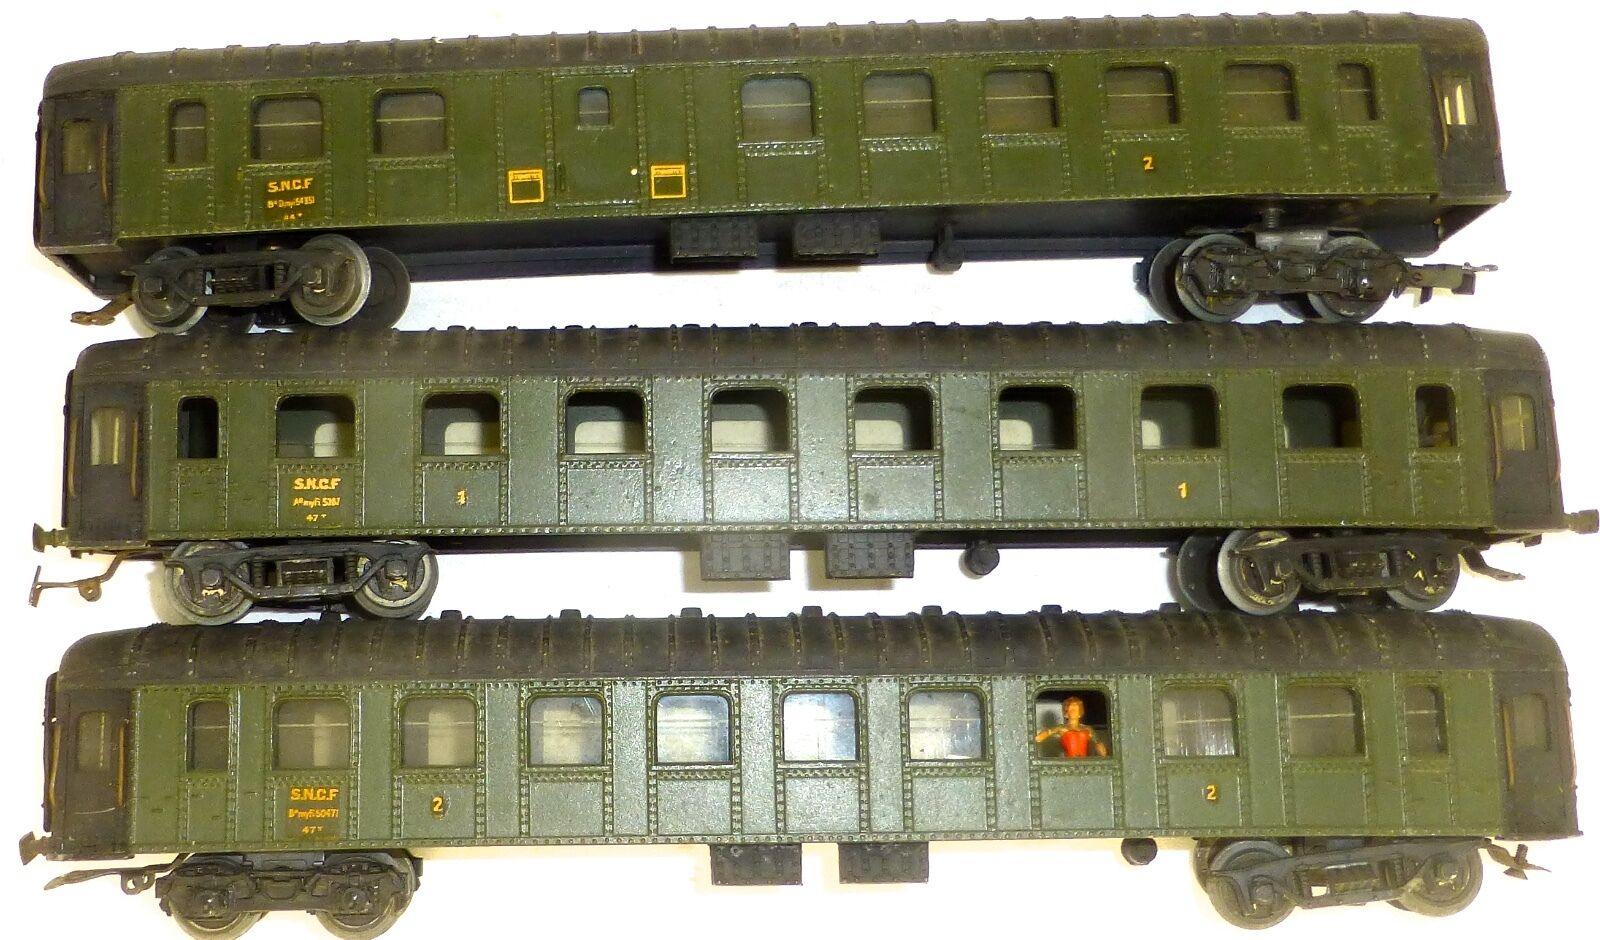 3x SNCF A myfi 50471 + 5287 Dmyi 54351 METALL Wagons H0 1 87 OVP  å